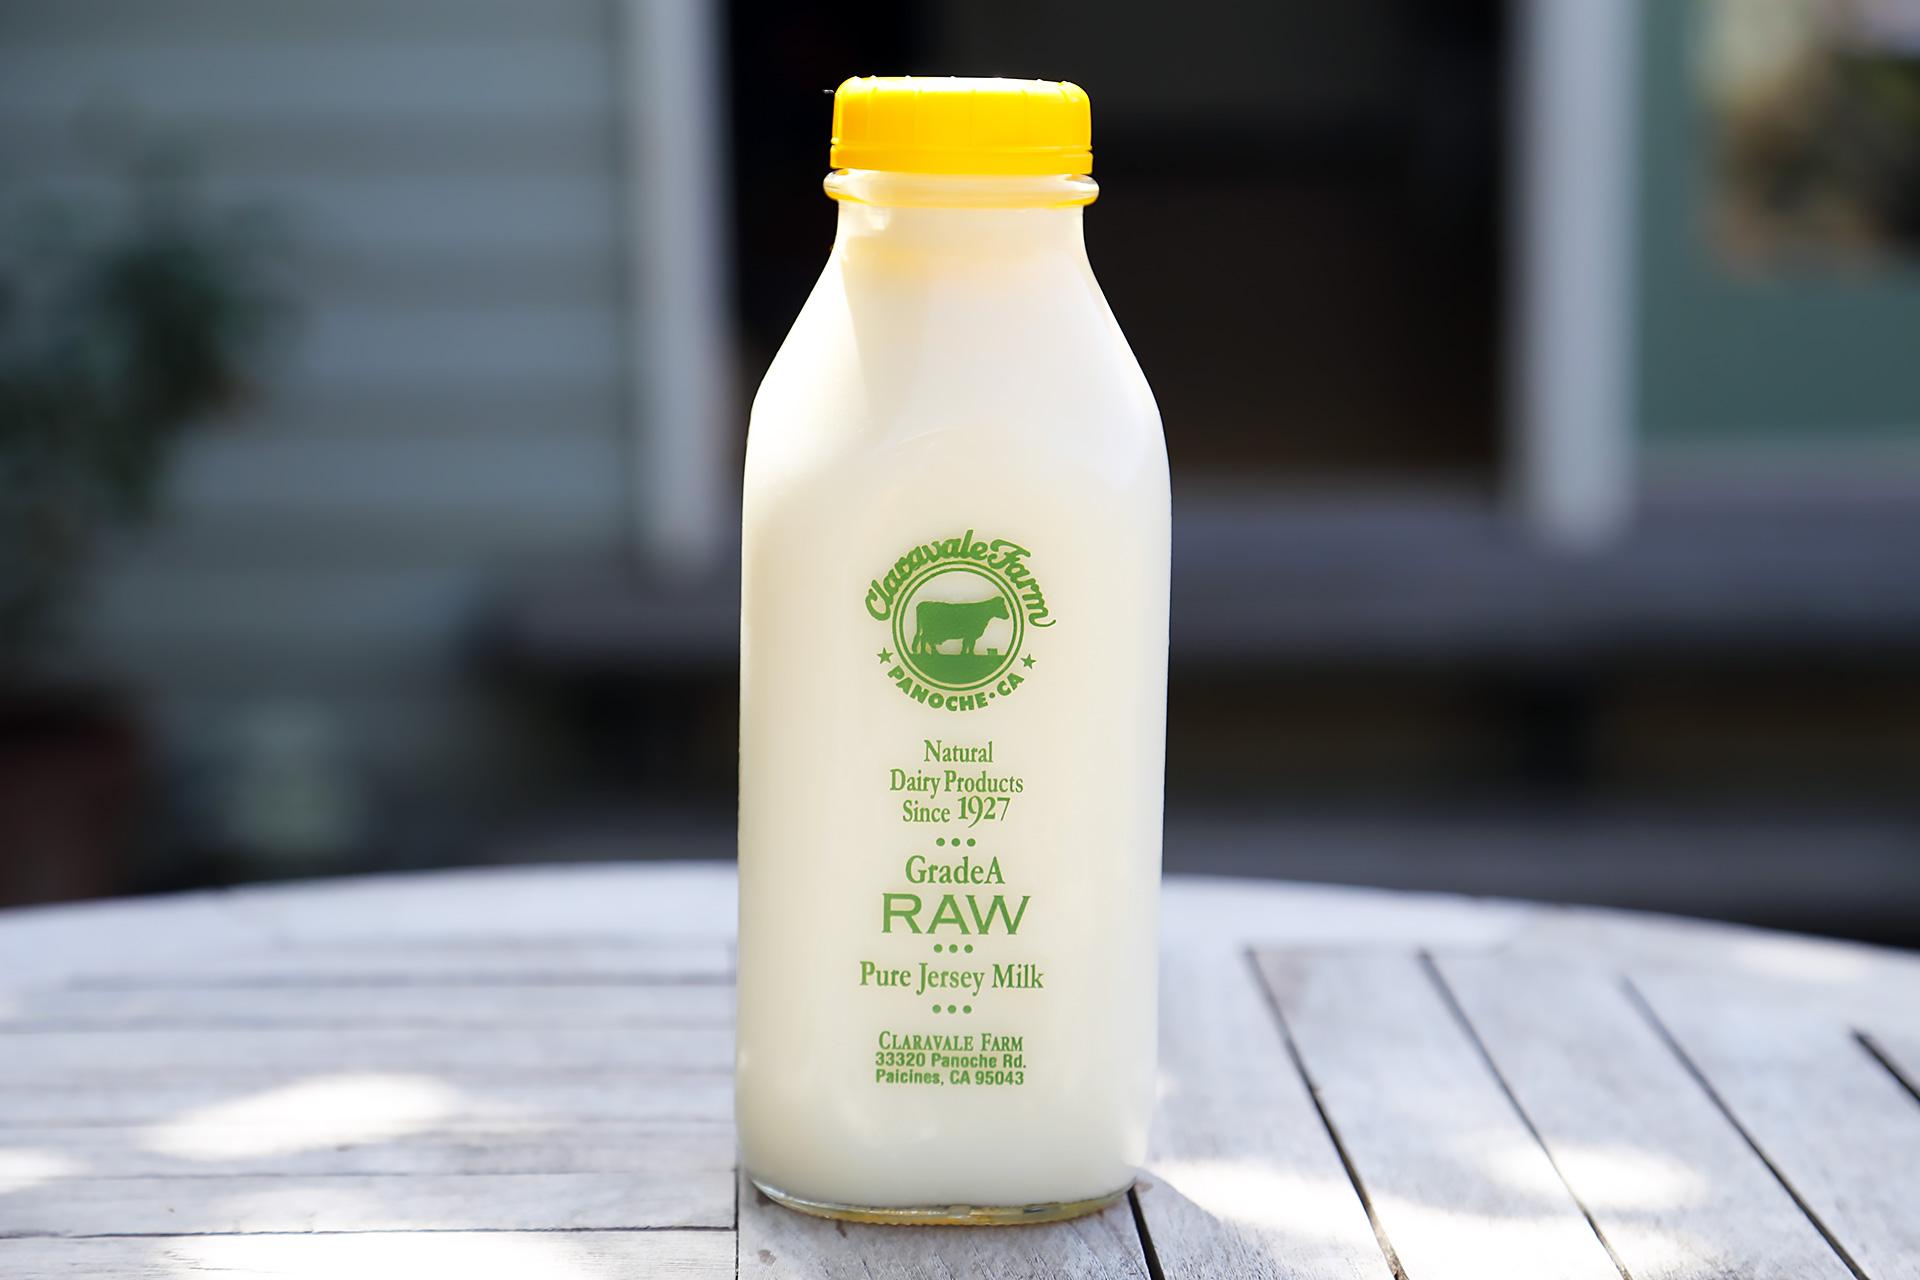 Claravale Raw Pure Jersey Milk